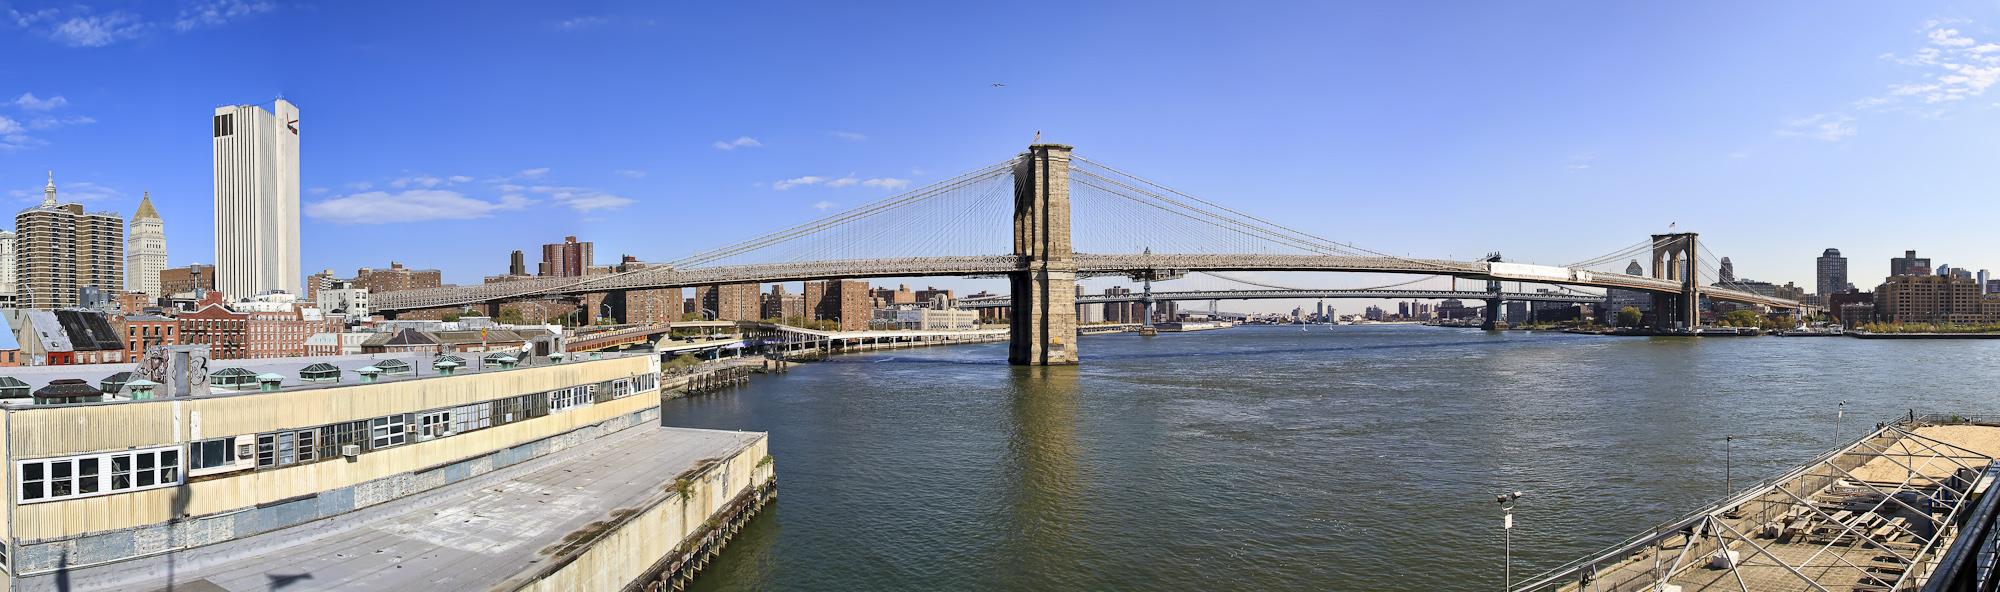 new york city :: brooklyn bridge